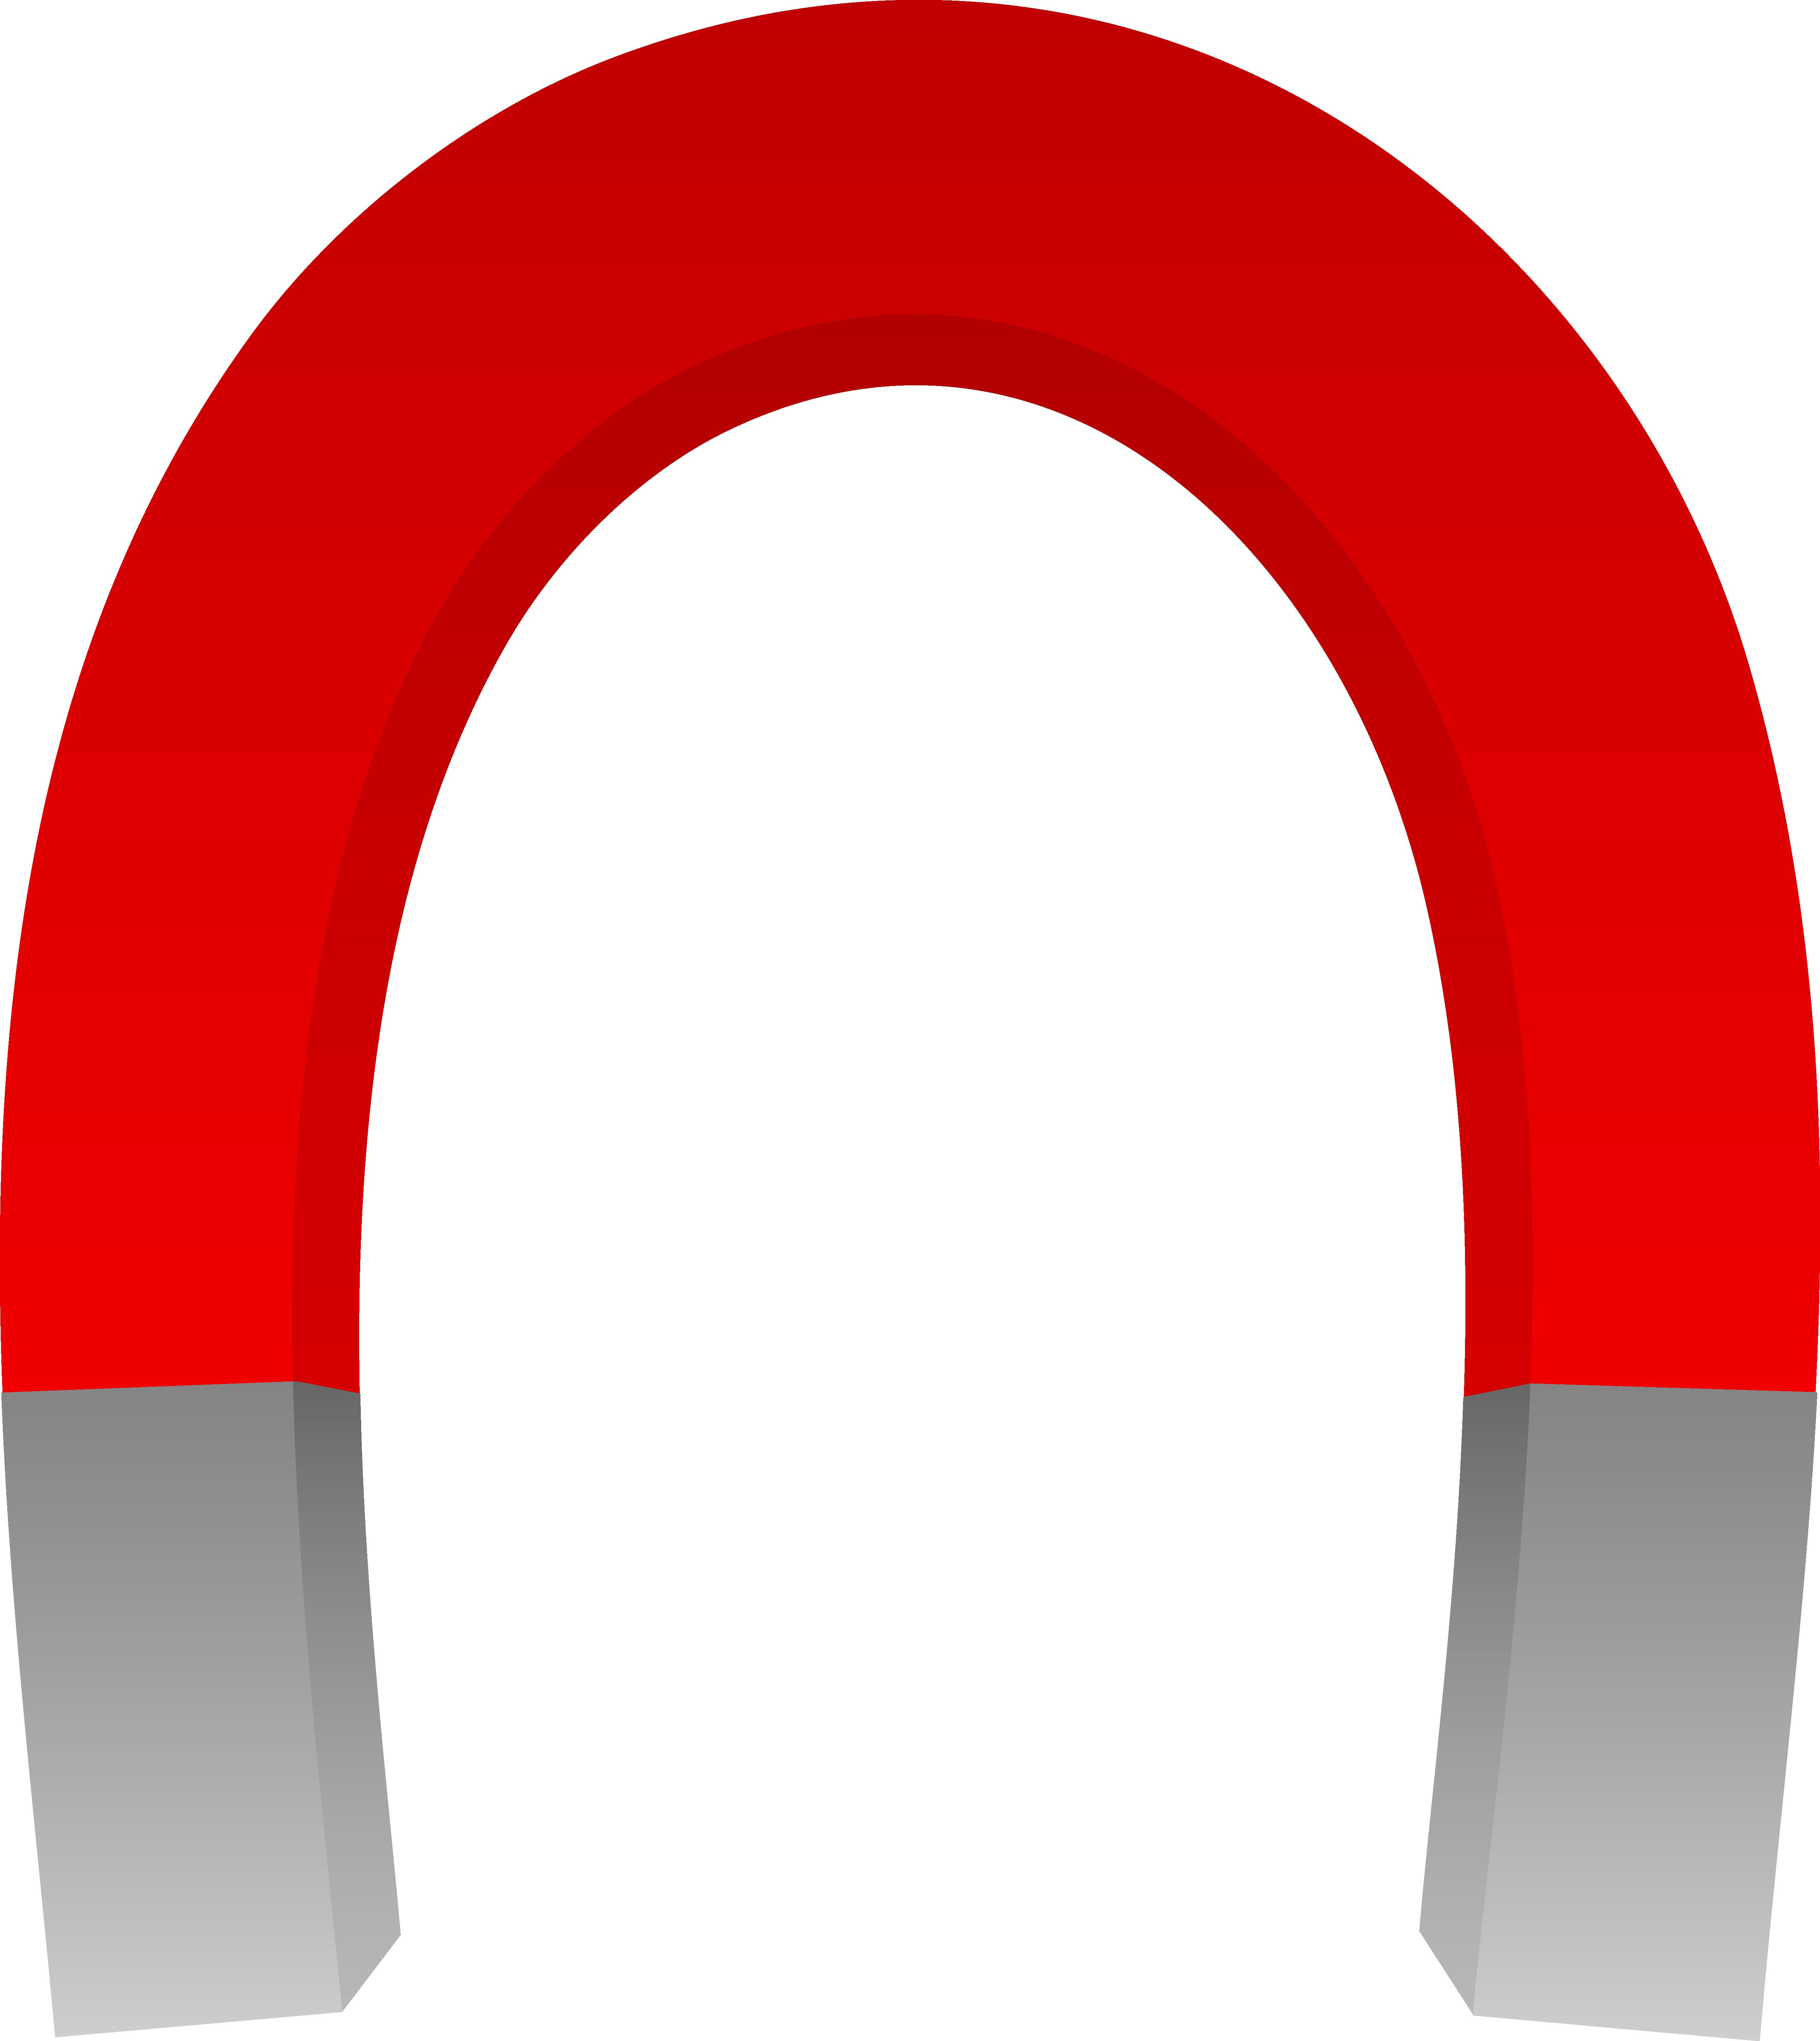 Horseshoe clipart clip art. Big red magnet free